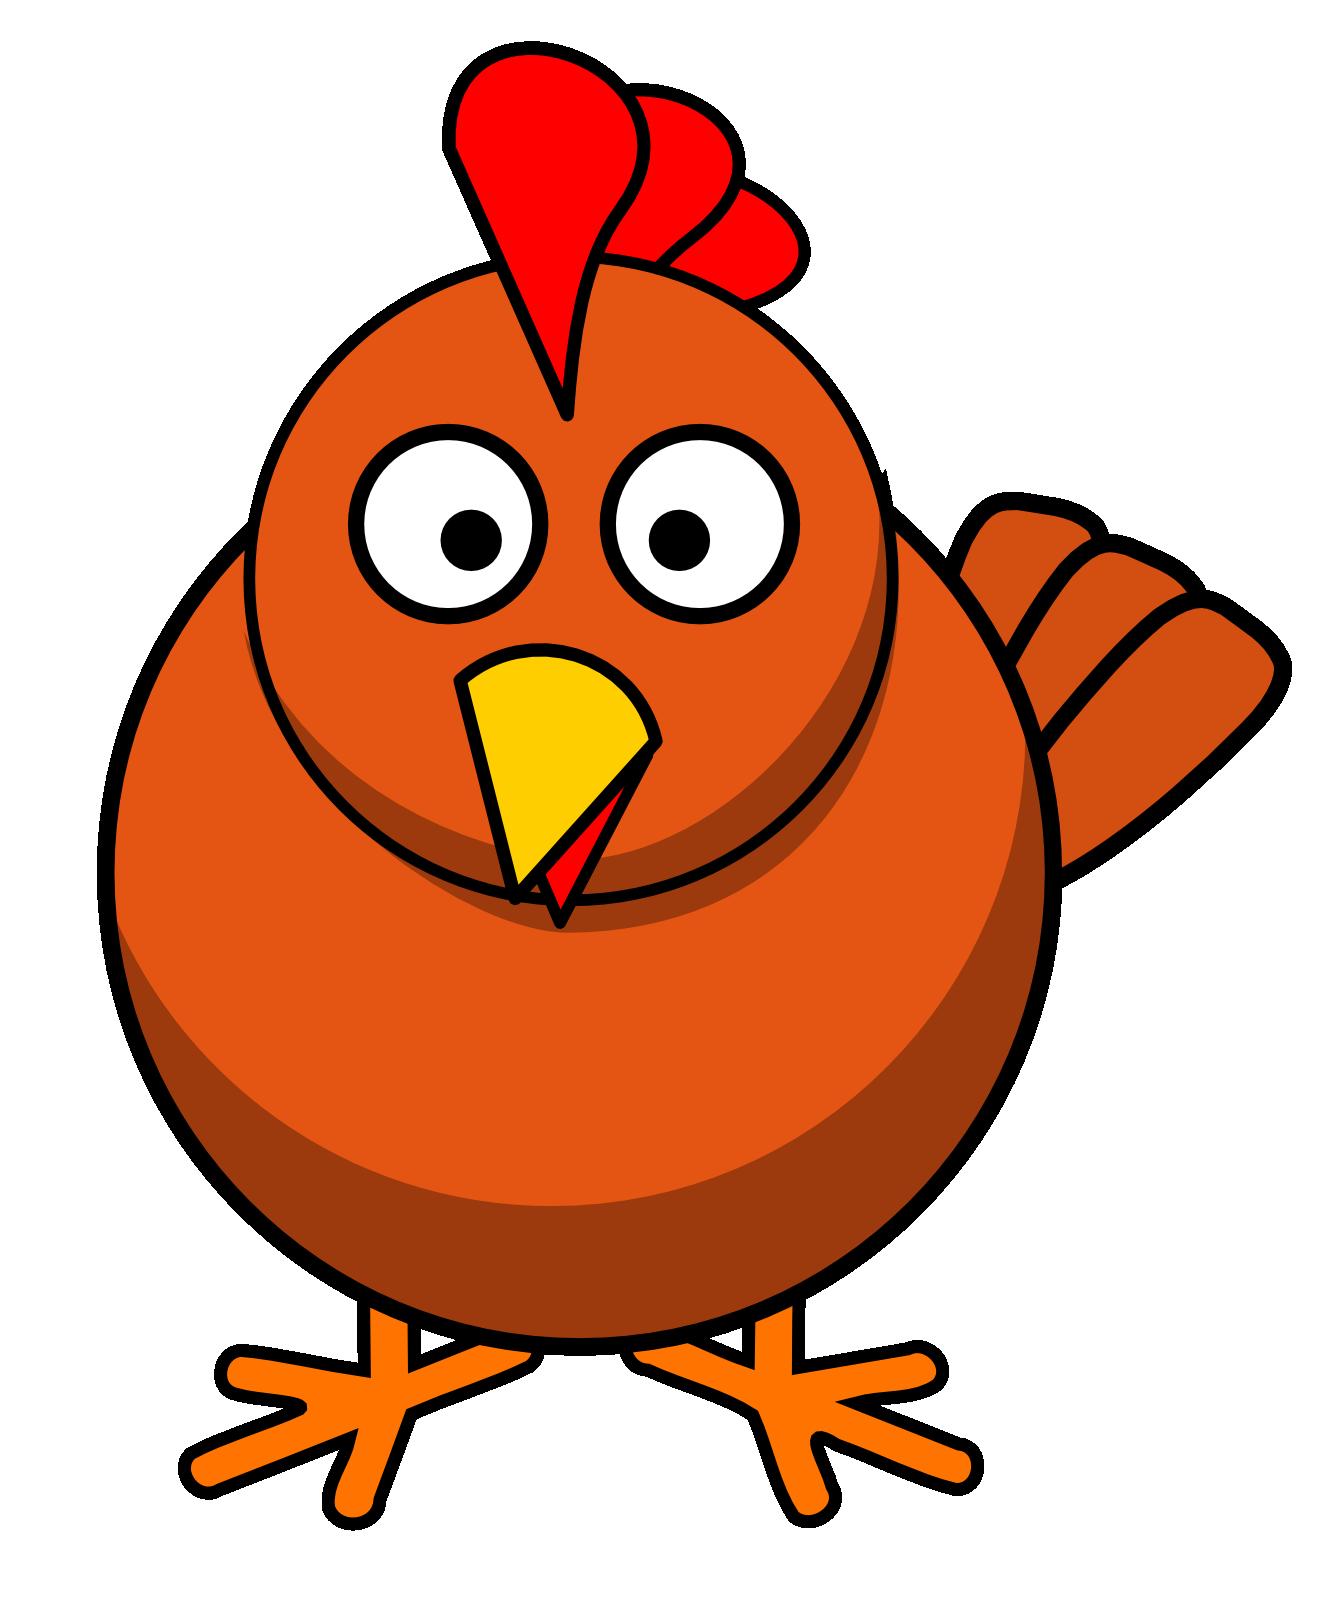 chicken%20egg%20clipart